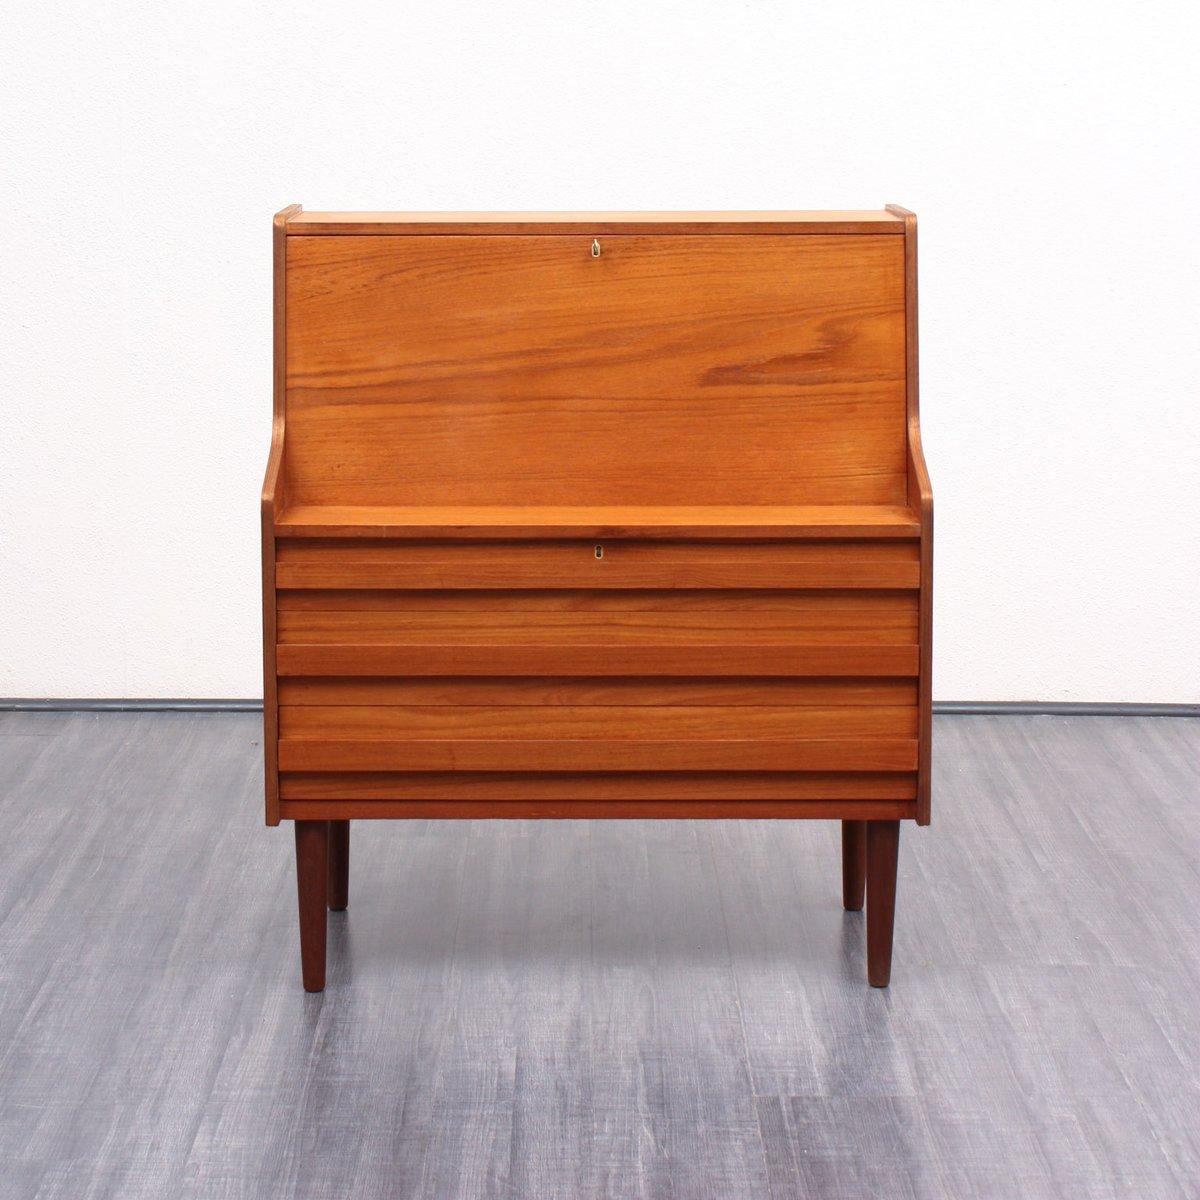 d nischer teak furnier sekret r von rooval 1960er bei. Black Bedroom Furniture Sets. Home Design Ideas